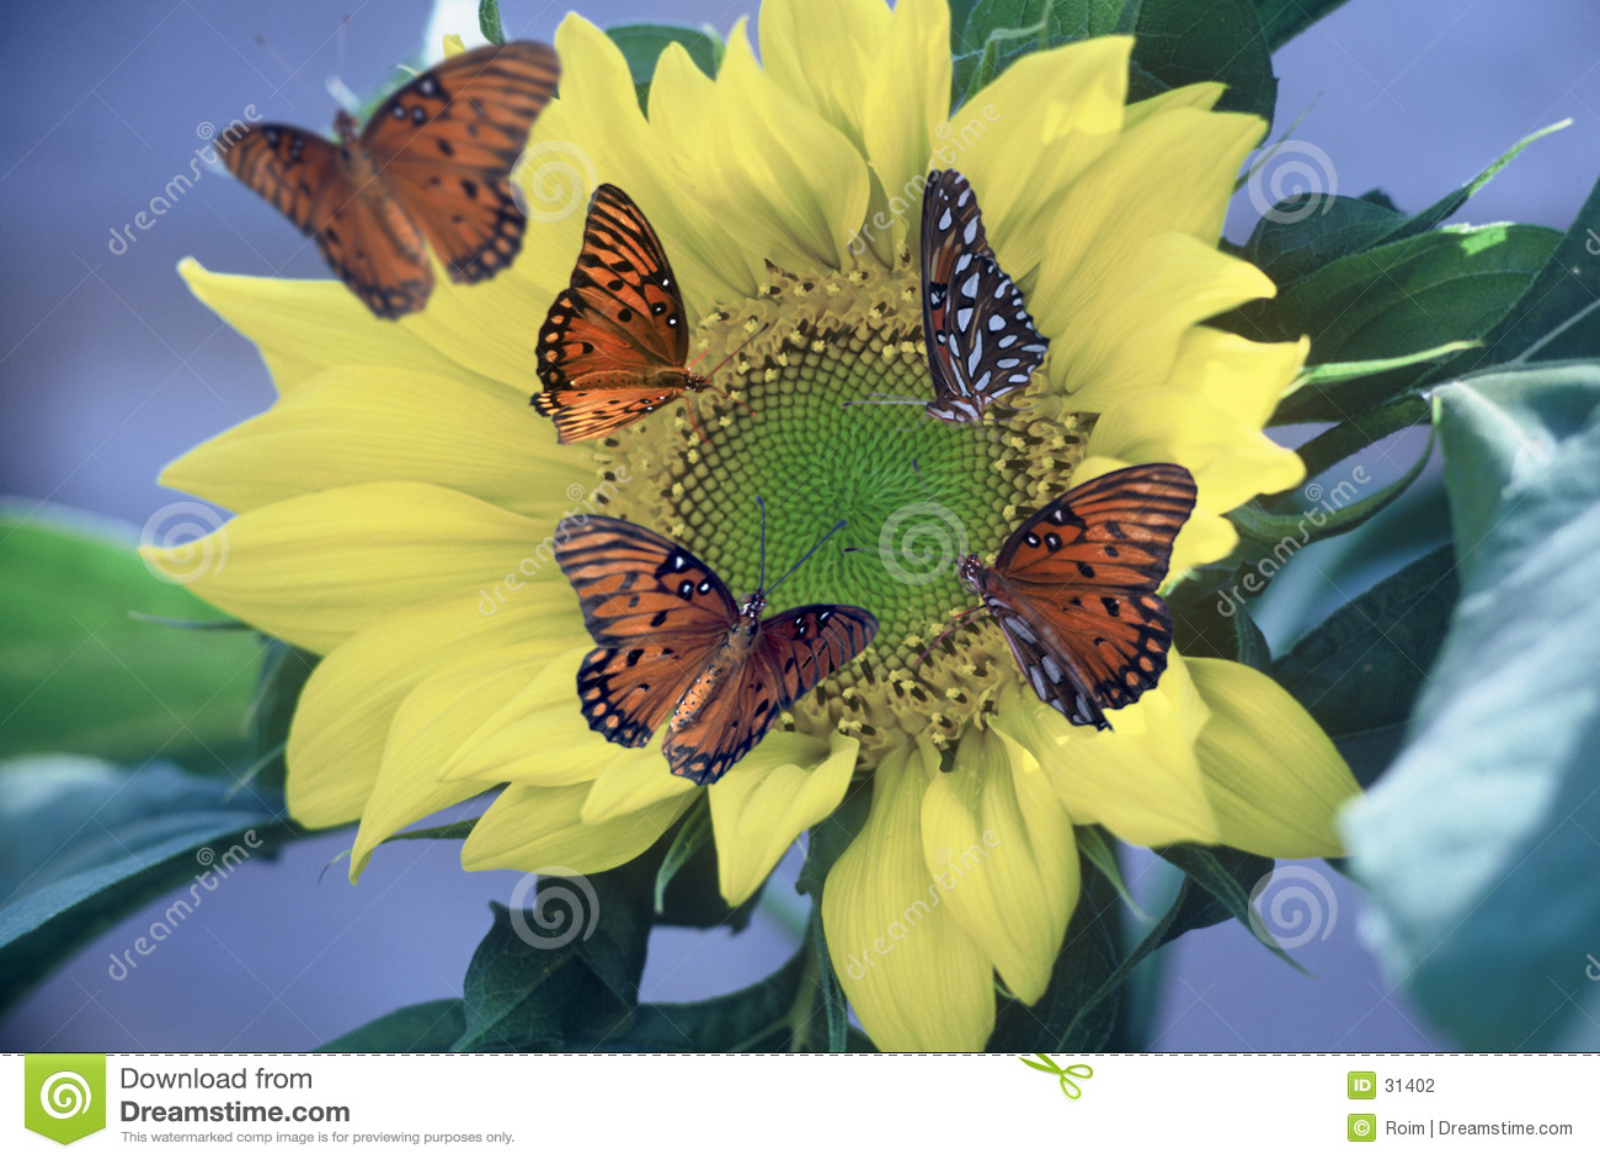 Gulf Fritillaries on Sunflower